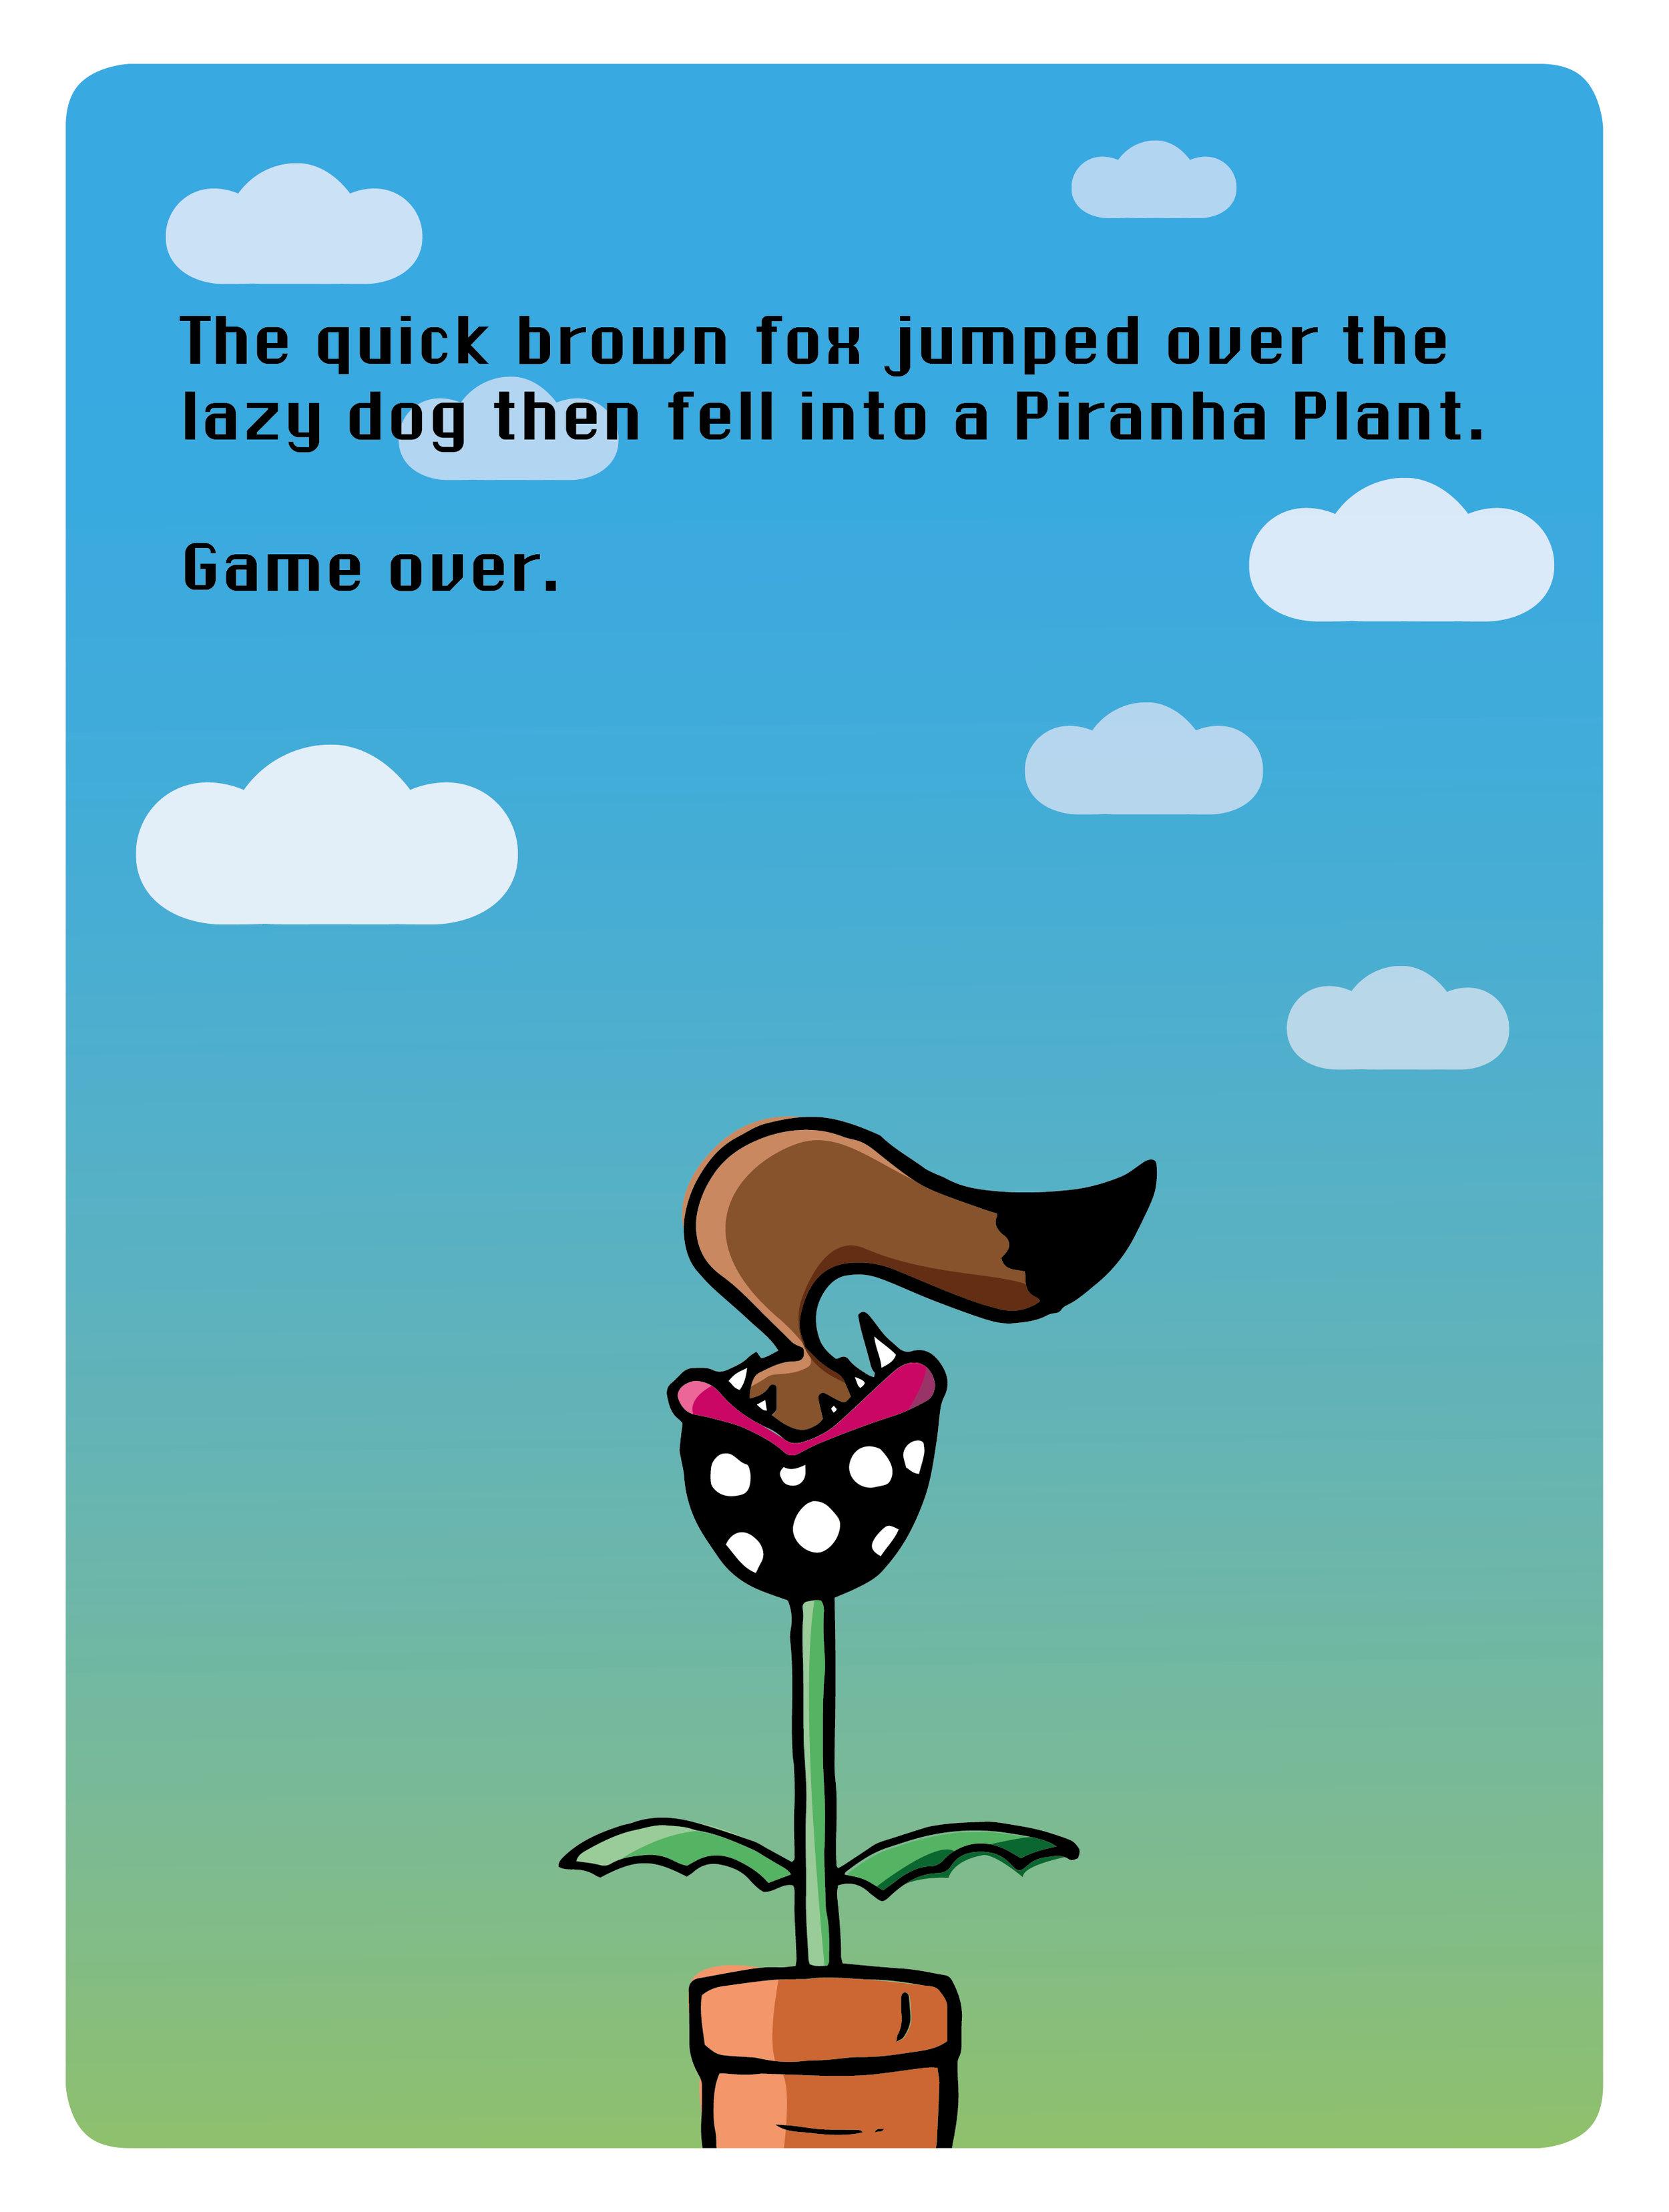 The Quick Brown Fox2.jpg